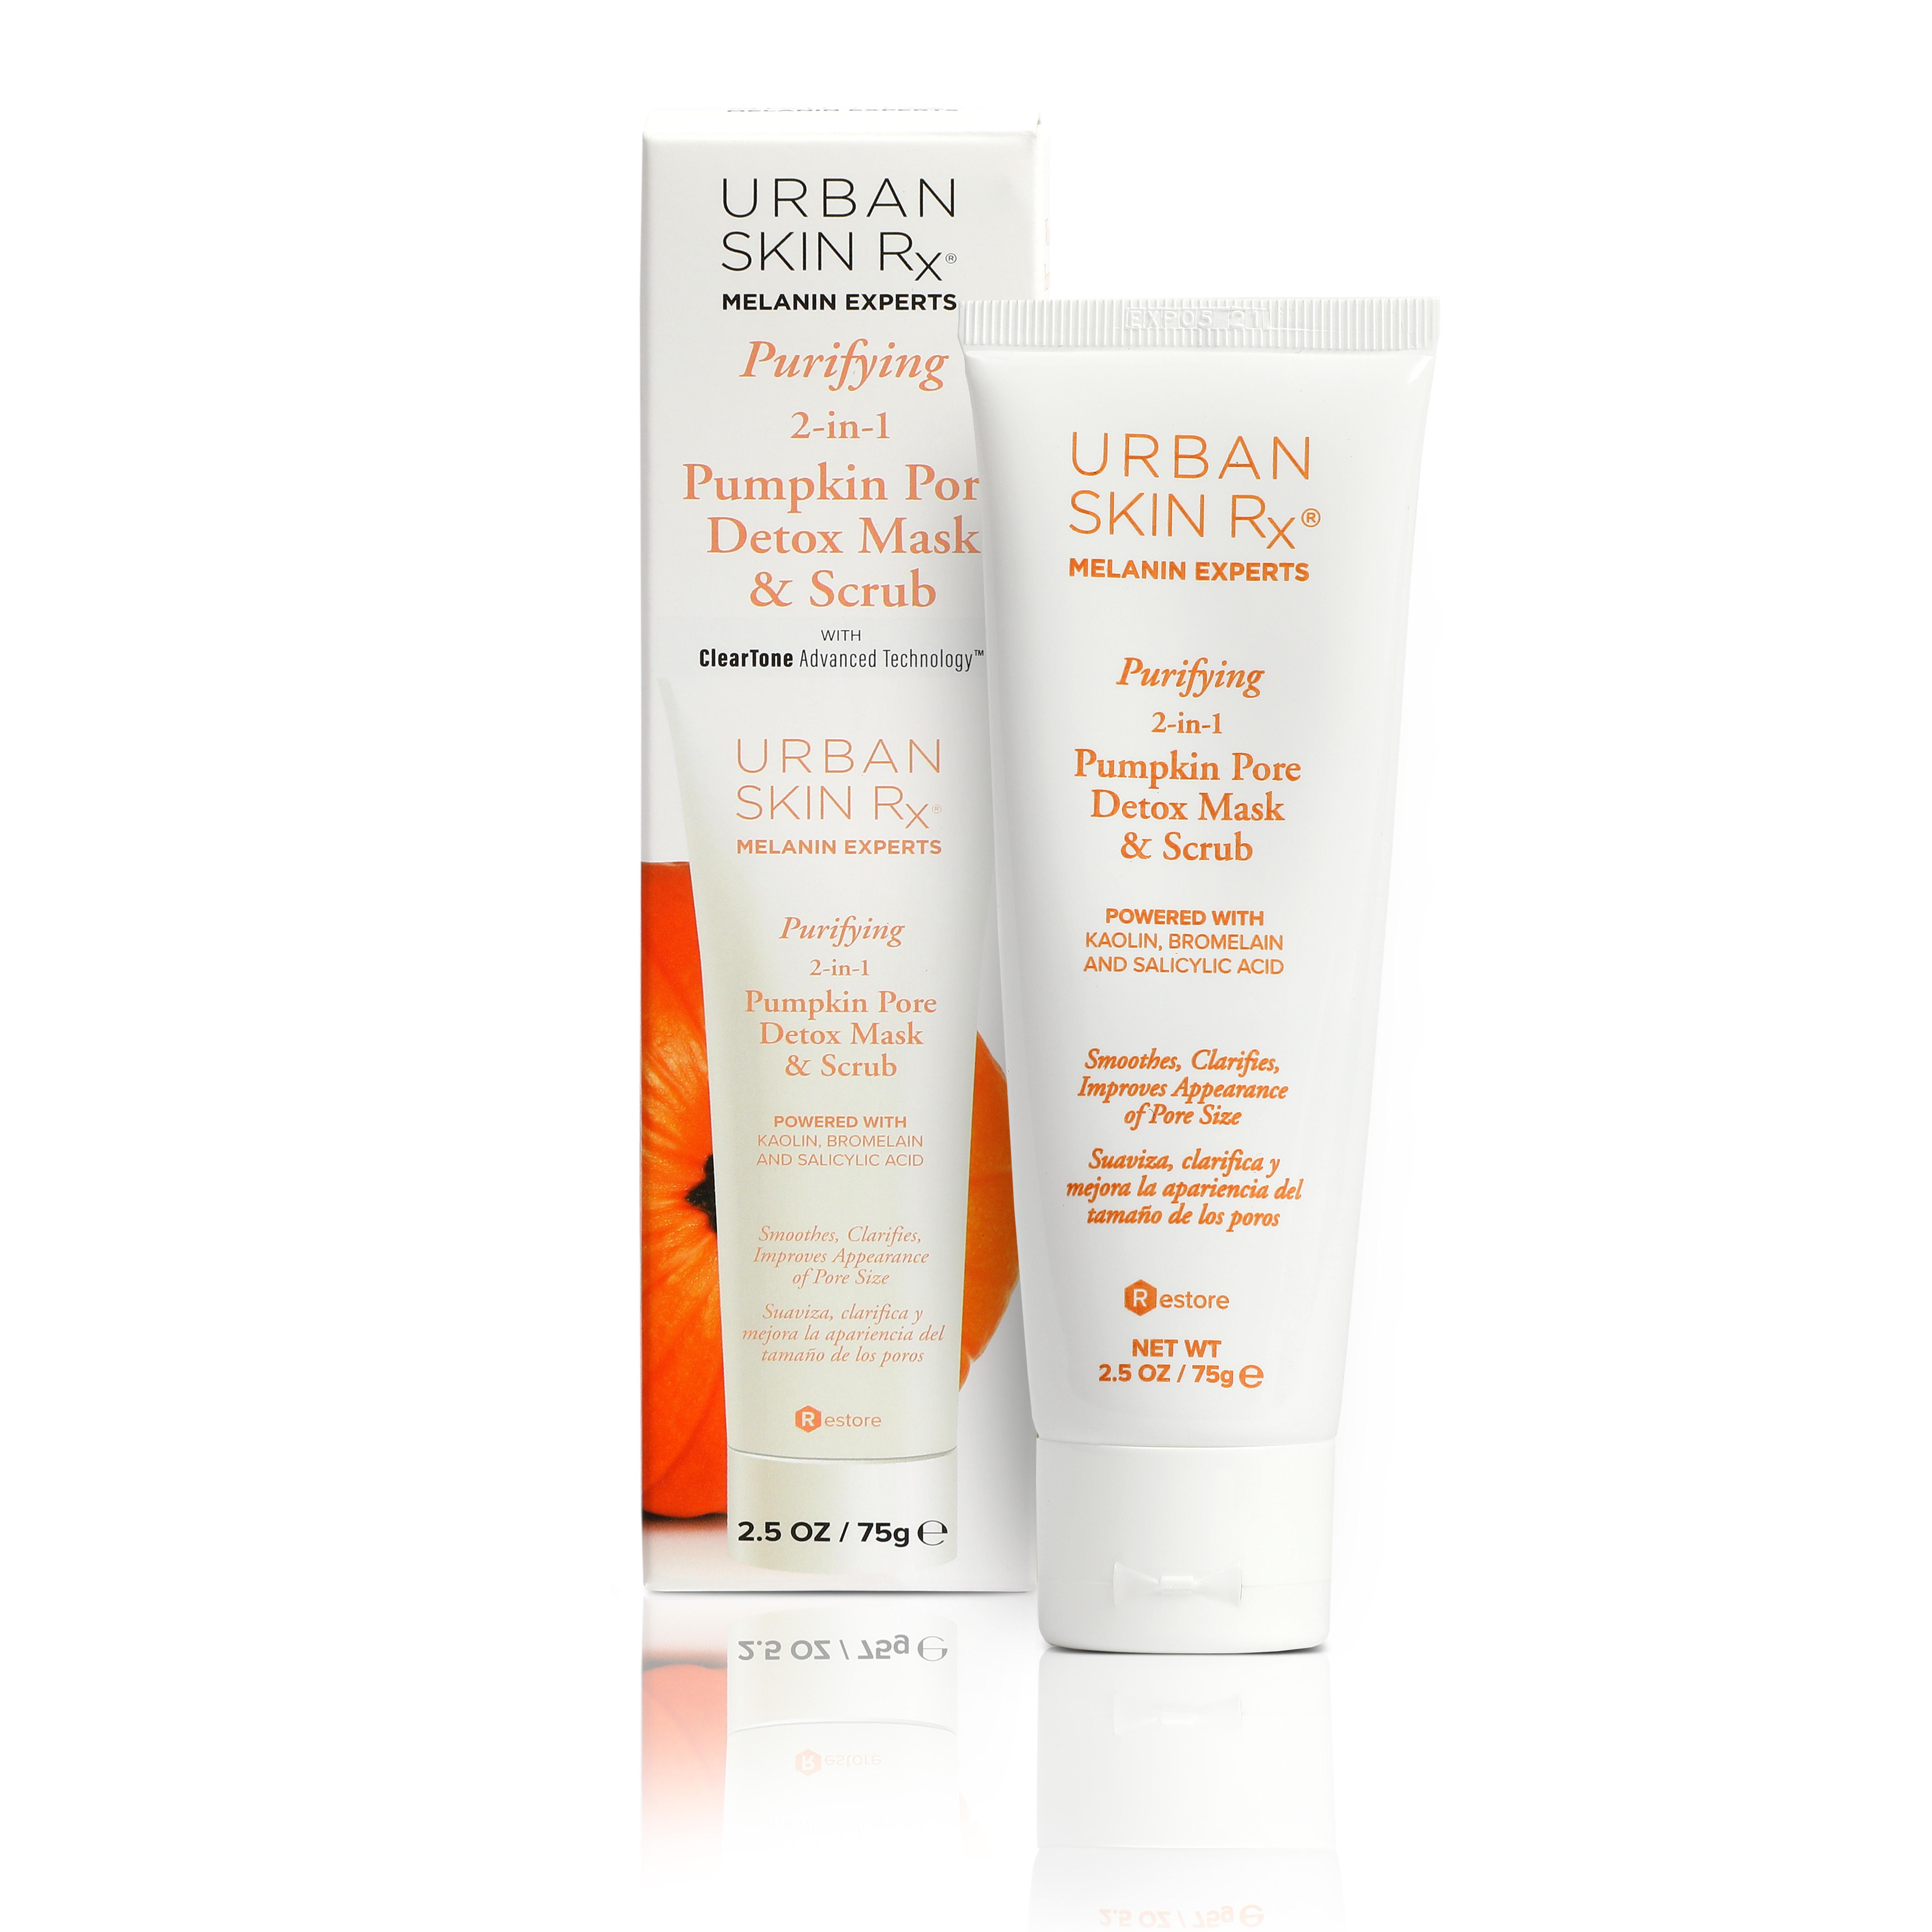 Urban Skin Rx Purifying Pumpkin Pore Mask